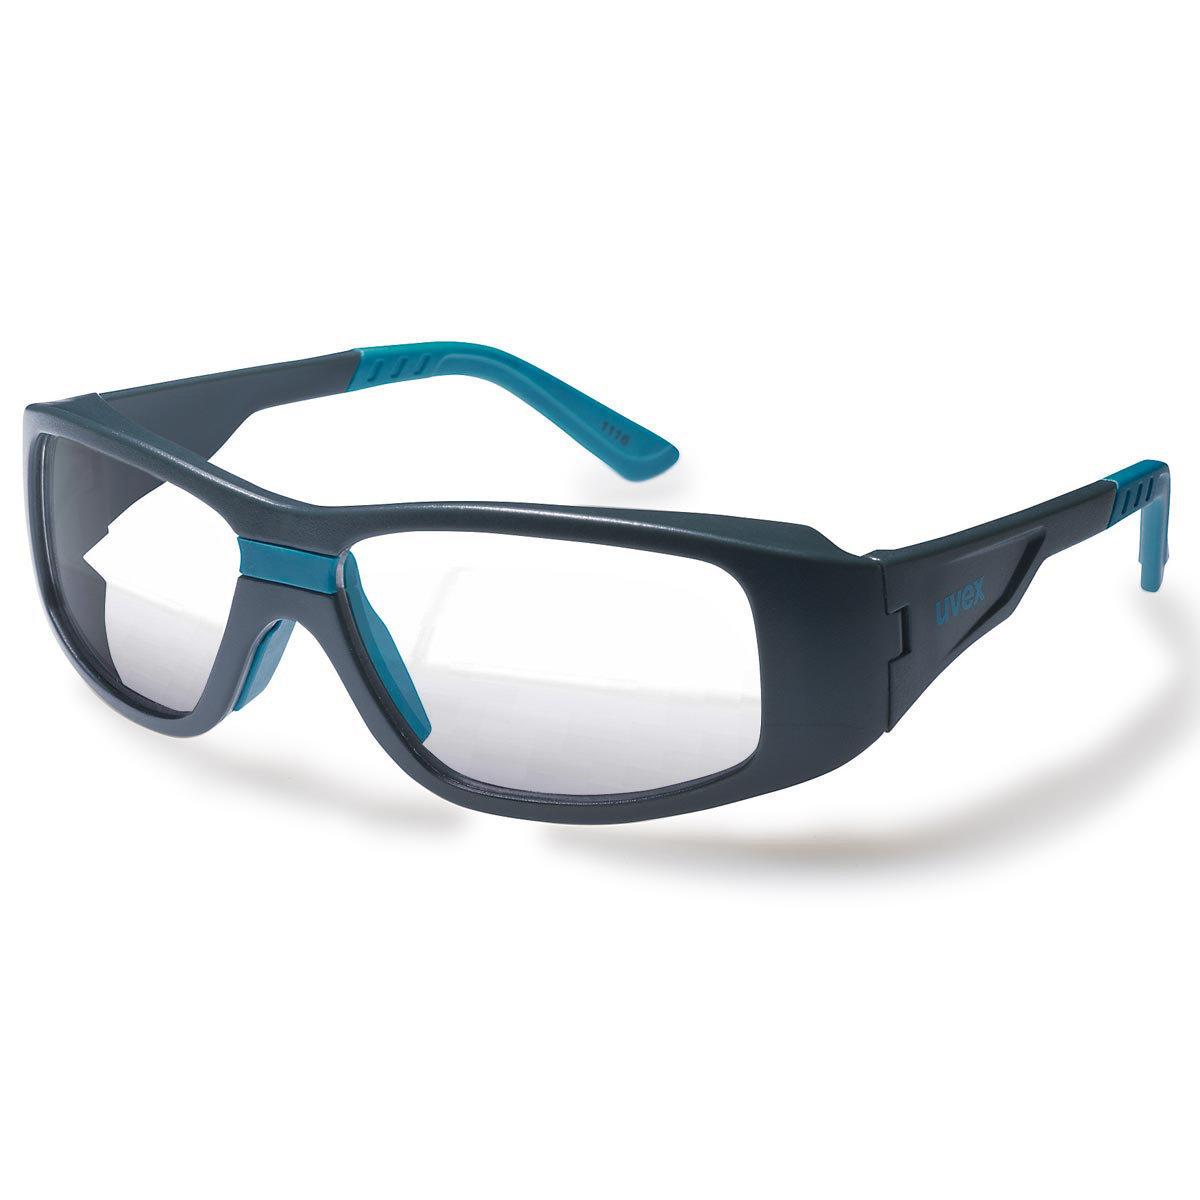 Uvex Korrektionsschutzbrille RX sp 5519 - UV blue protect